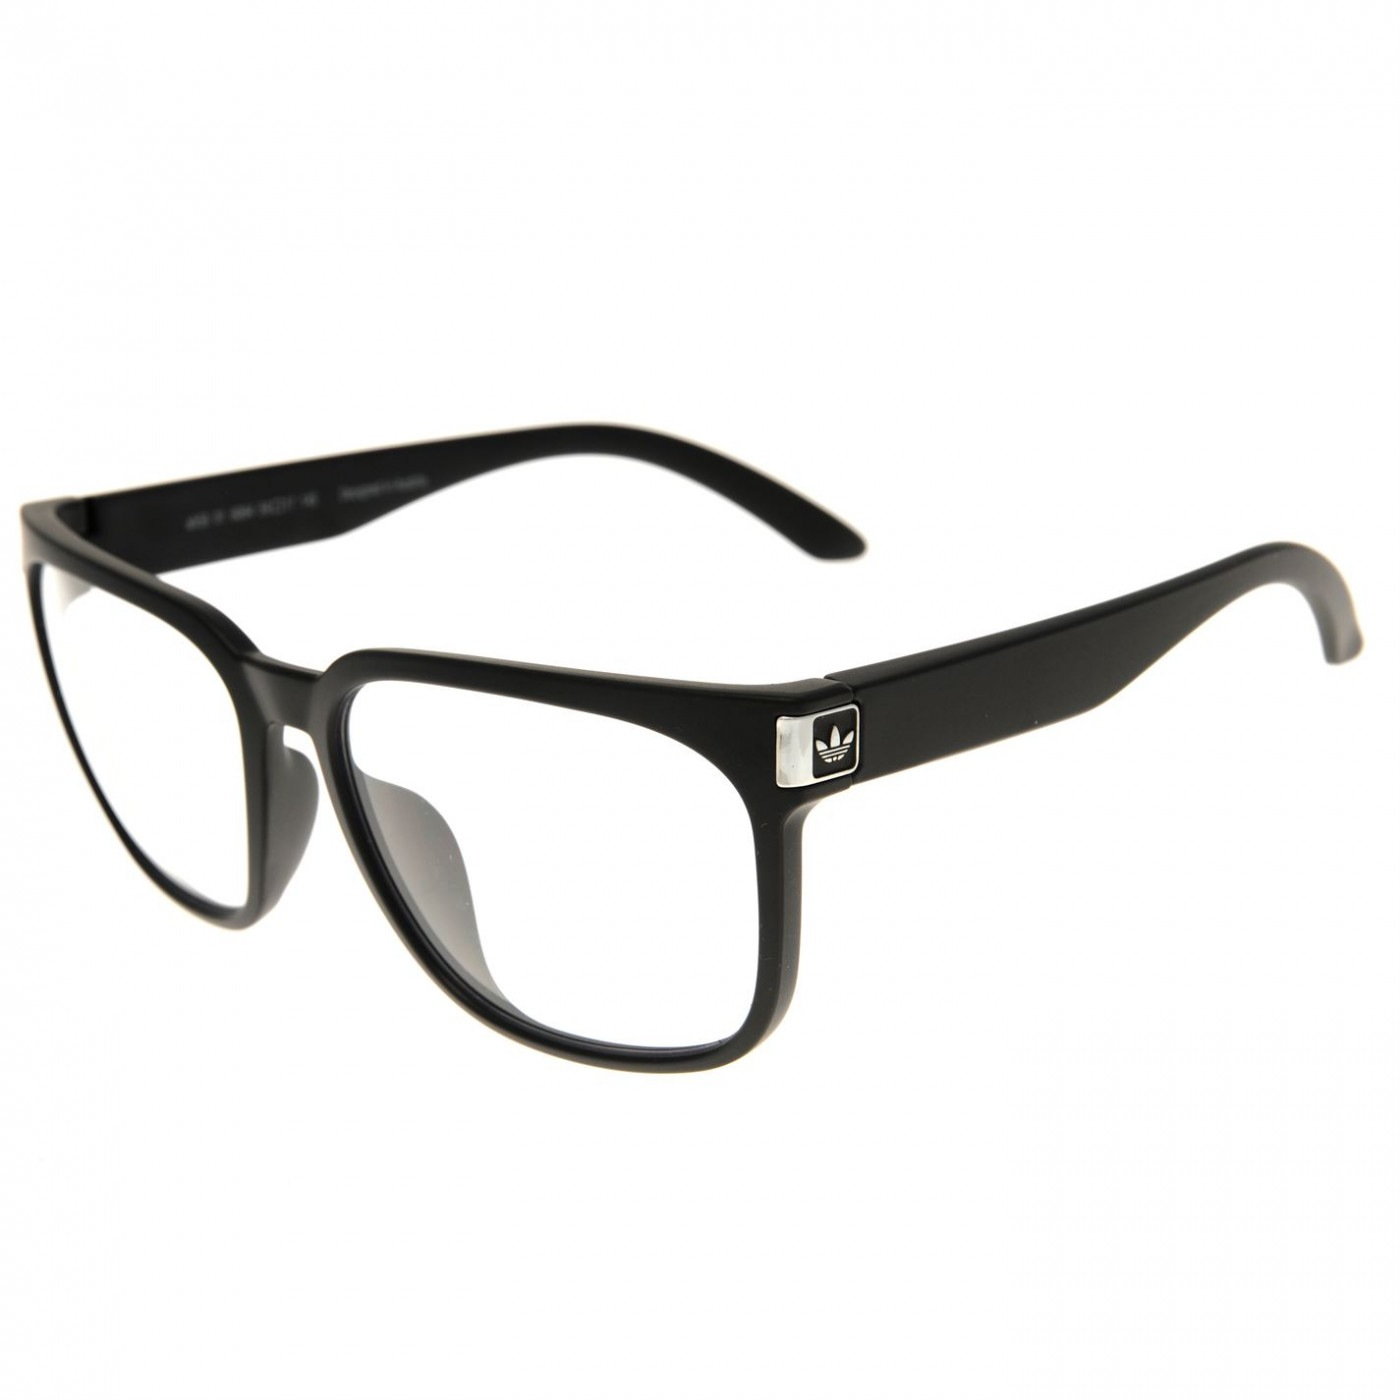 Sydney Sydney Mens Adidas Adidas Sunglasses Sunglasses Adidas Factcool Factcool Mens mNOv0w8n